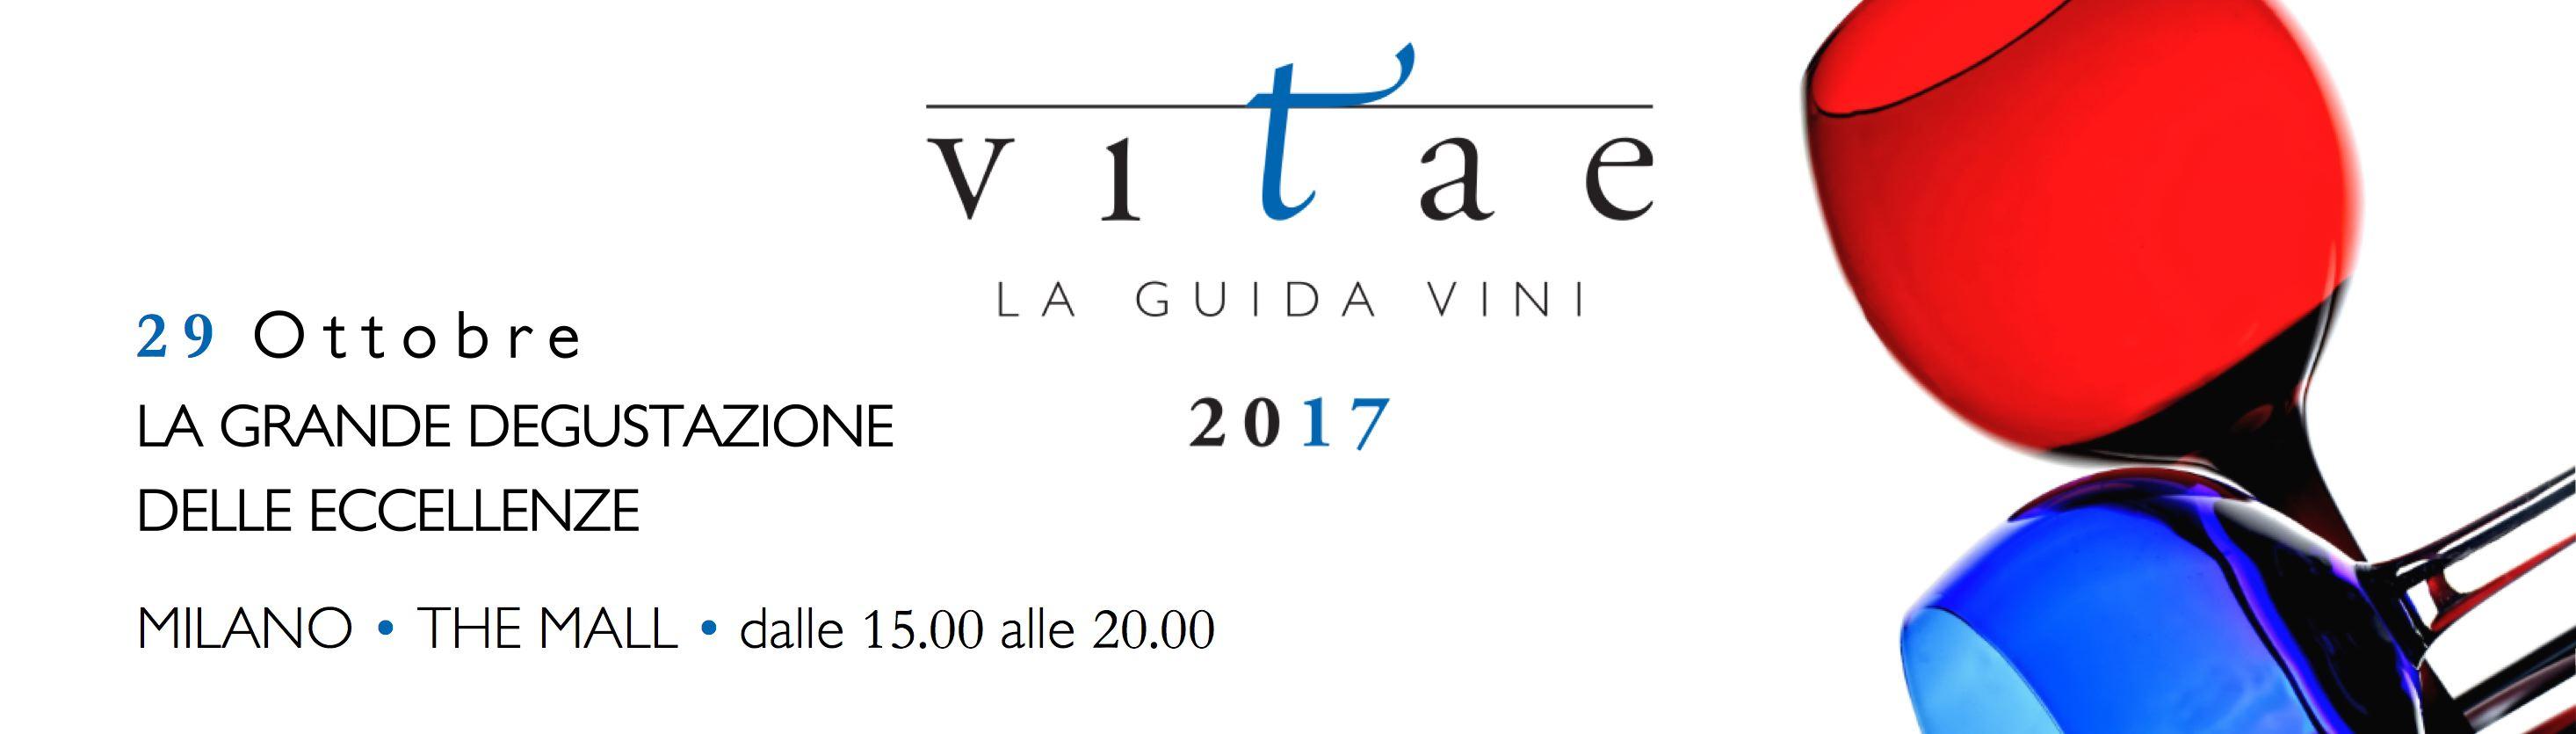 Guida_Vitae_2017